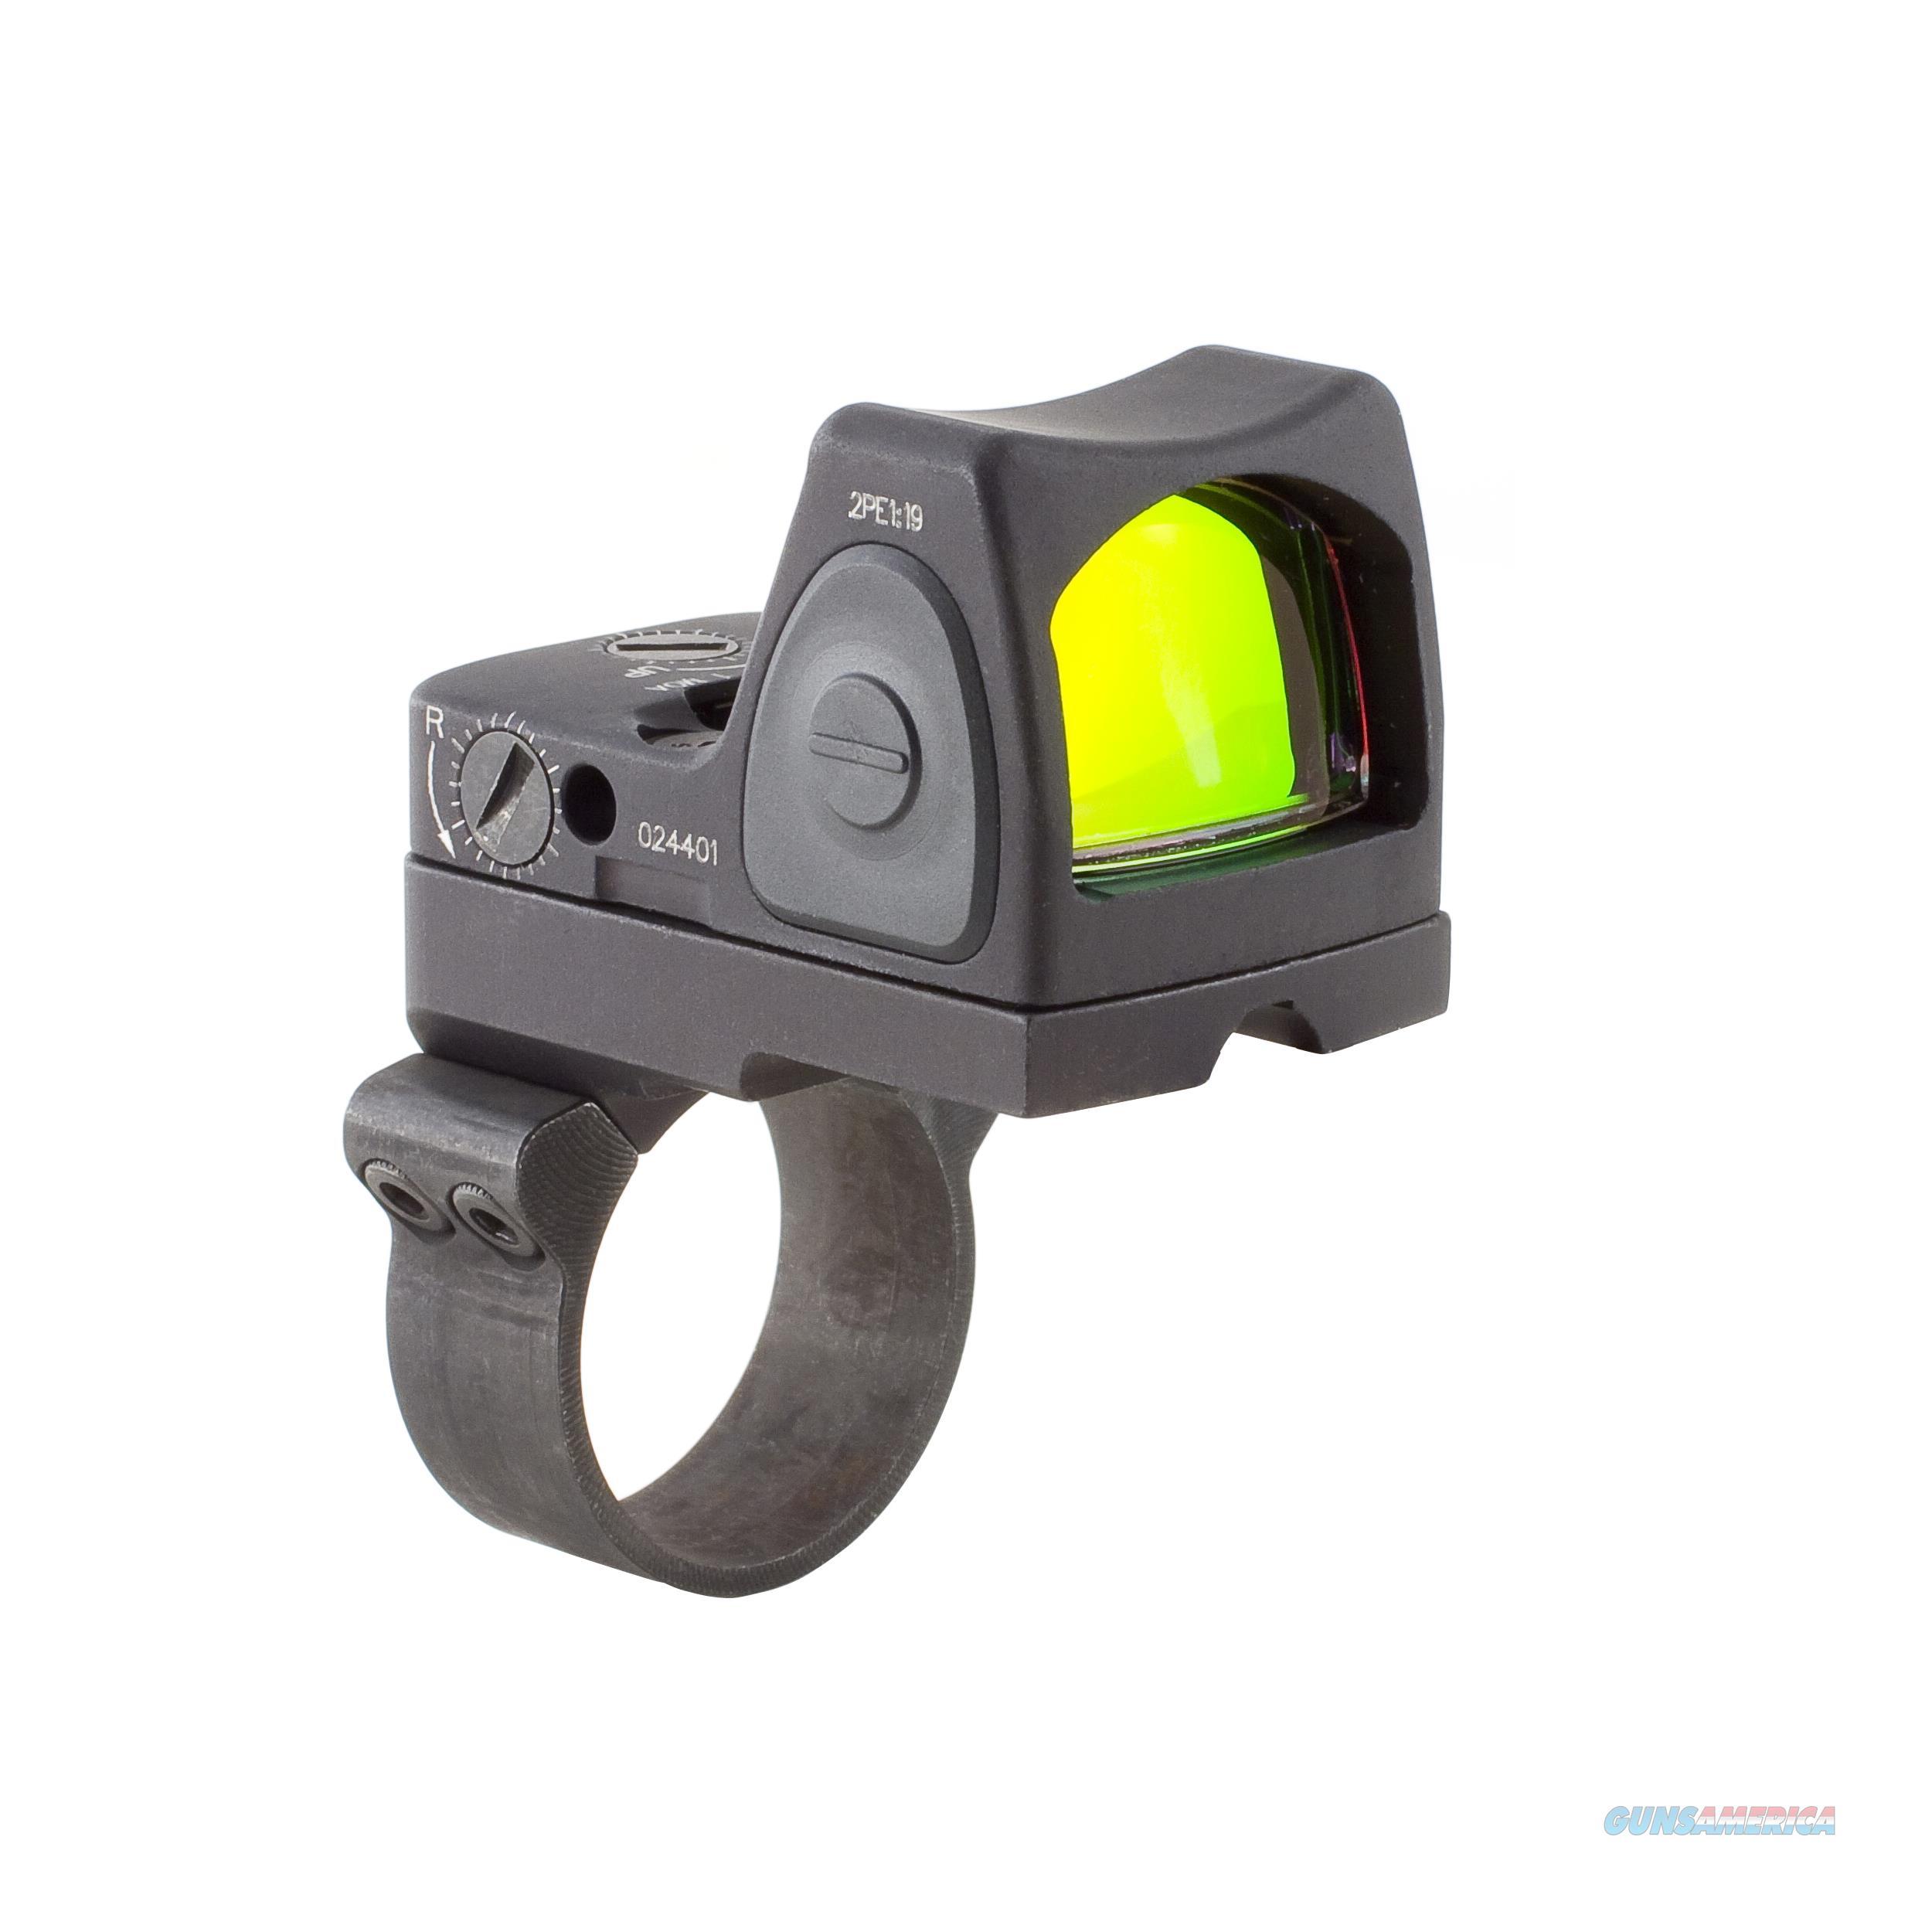 Trijicon Rmr Adjustable Led Sight RM07-36  Non-Guns > Iron/Metal/Peep Sights